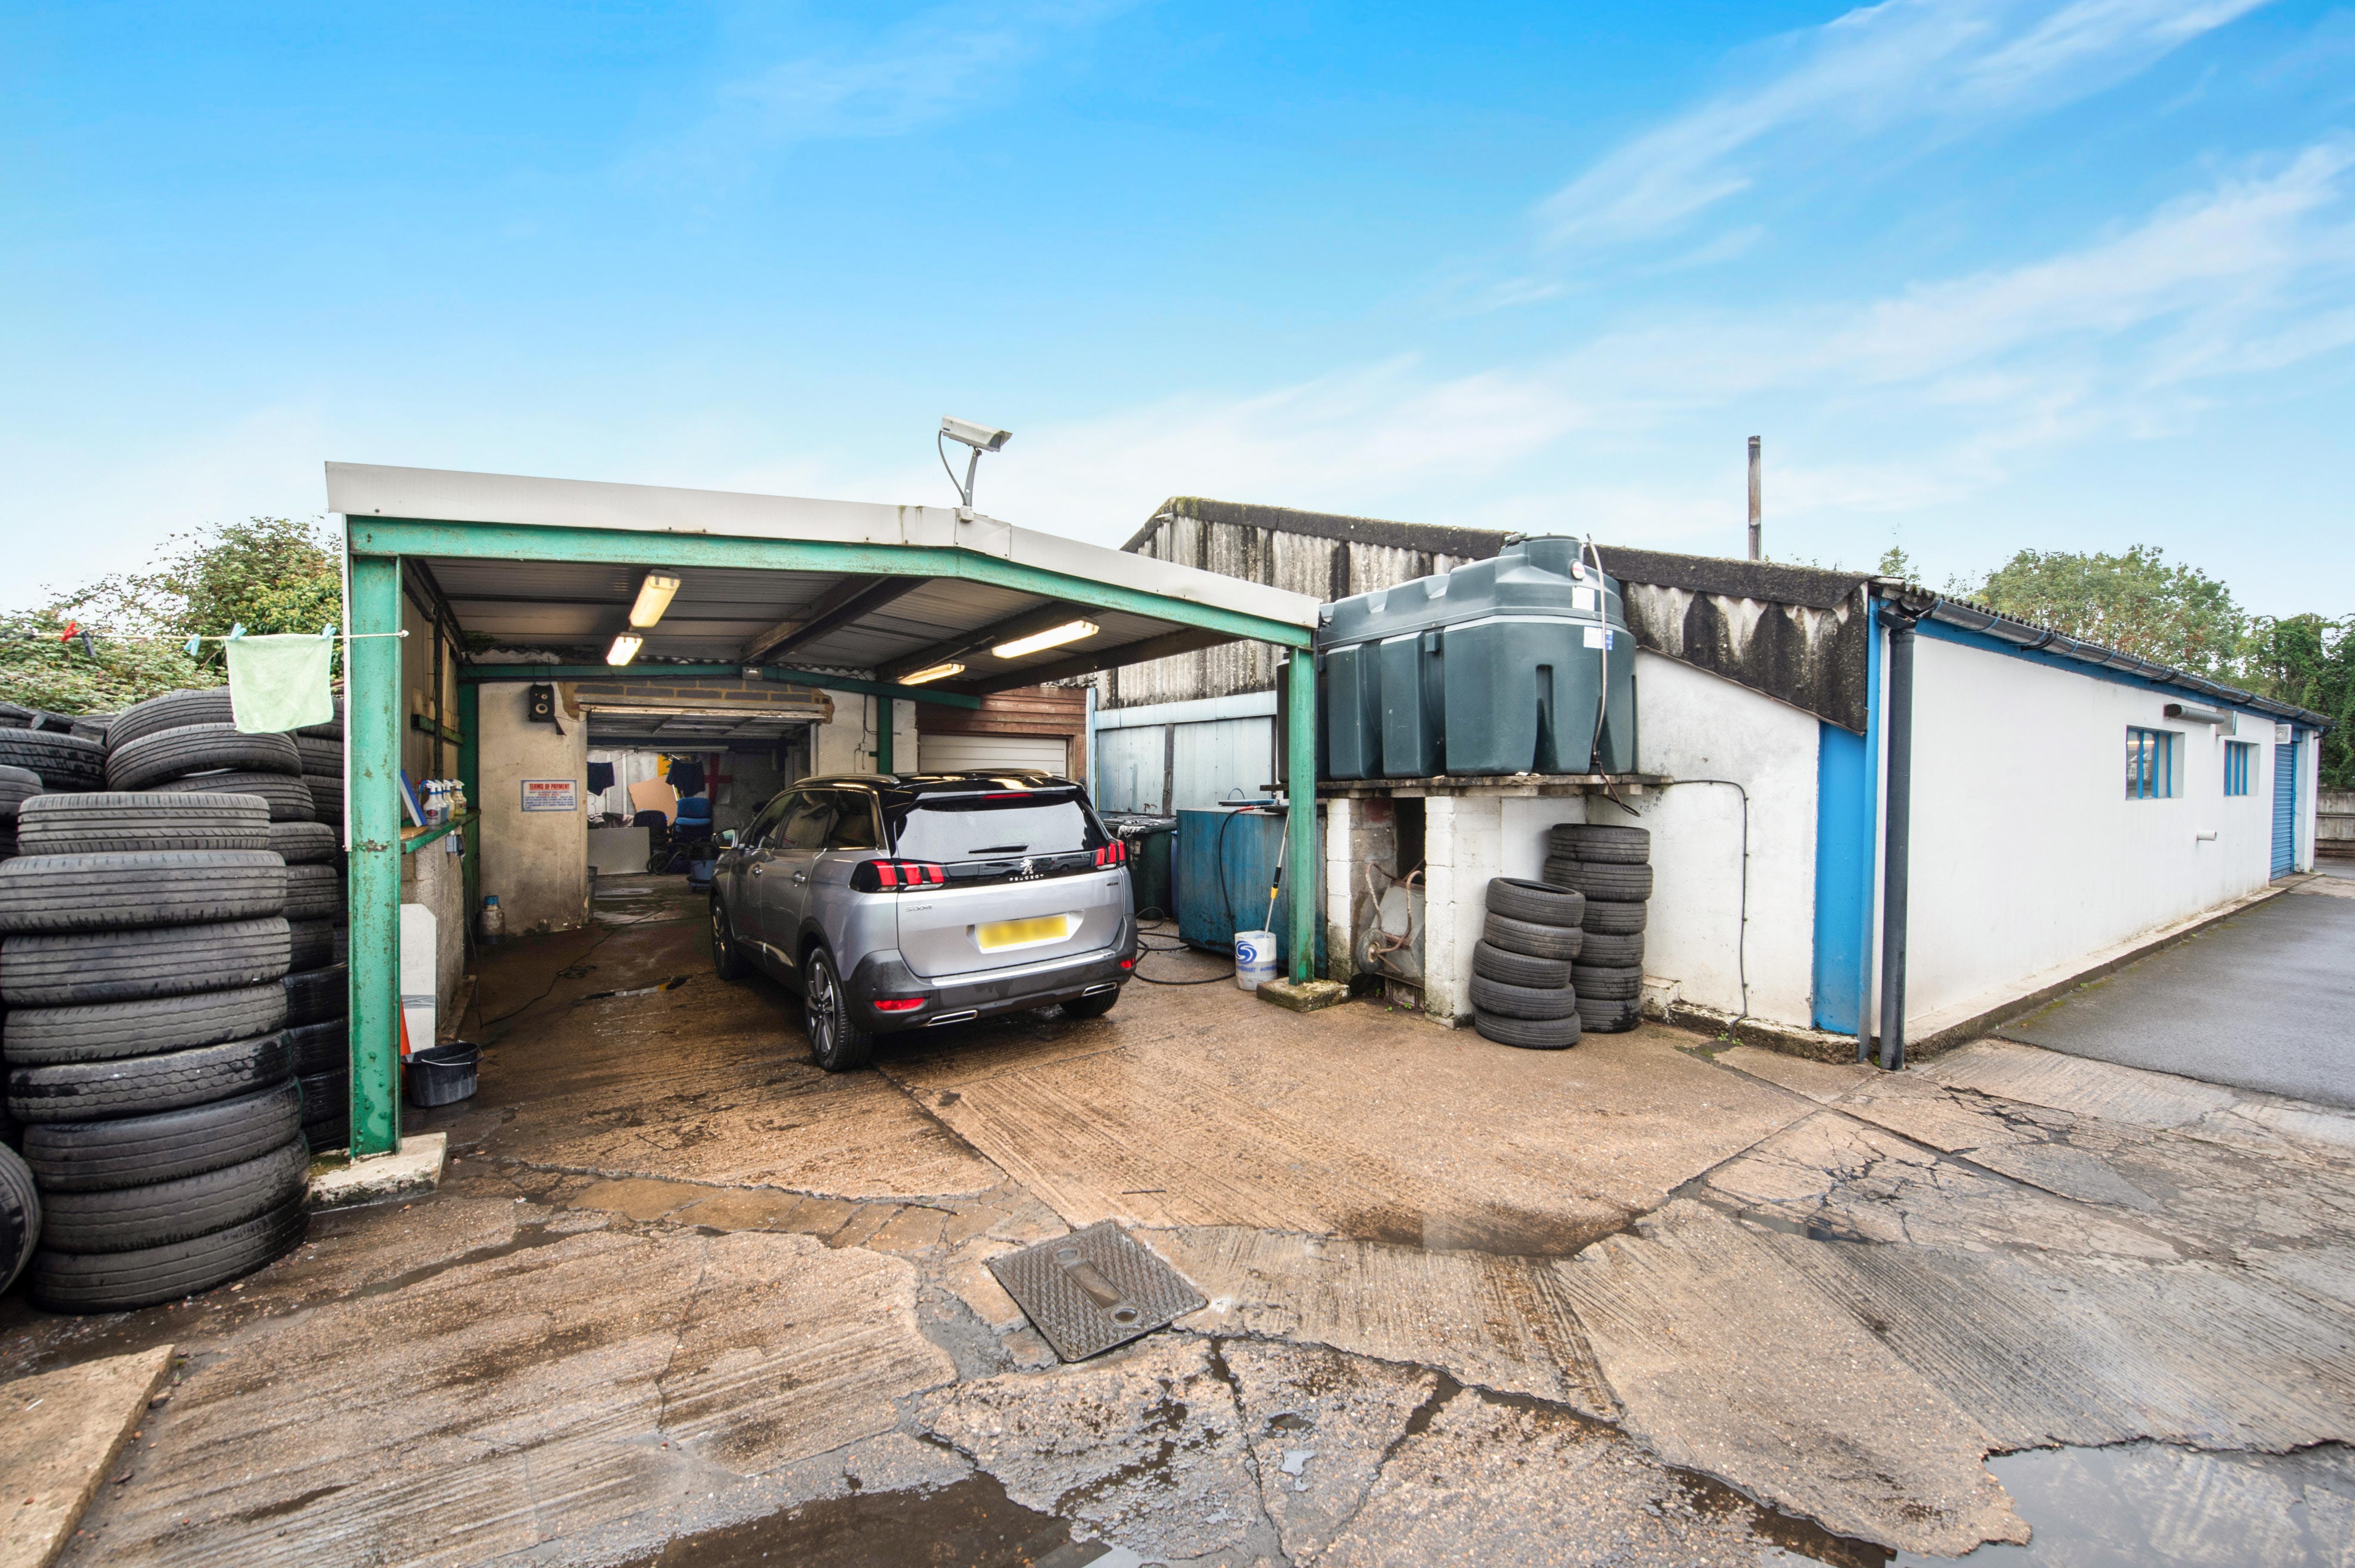 Townsend Garage Thame Road, Haddenham, Industrial For Sale - PREP AREA.jpg